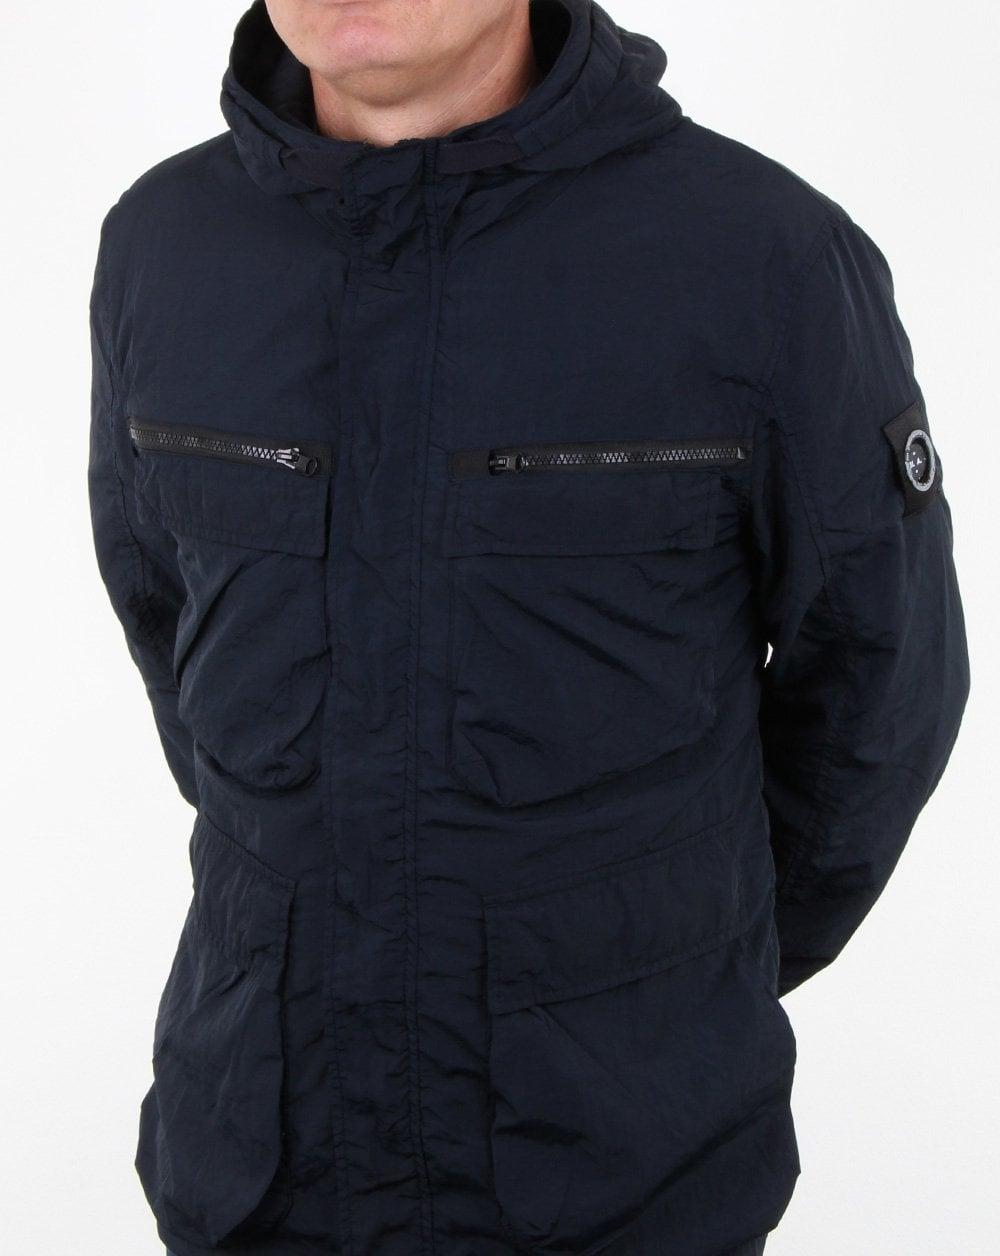 Marshall Artist Garment Dyed Field Jacket Navy Mens Jacket Smart